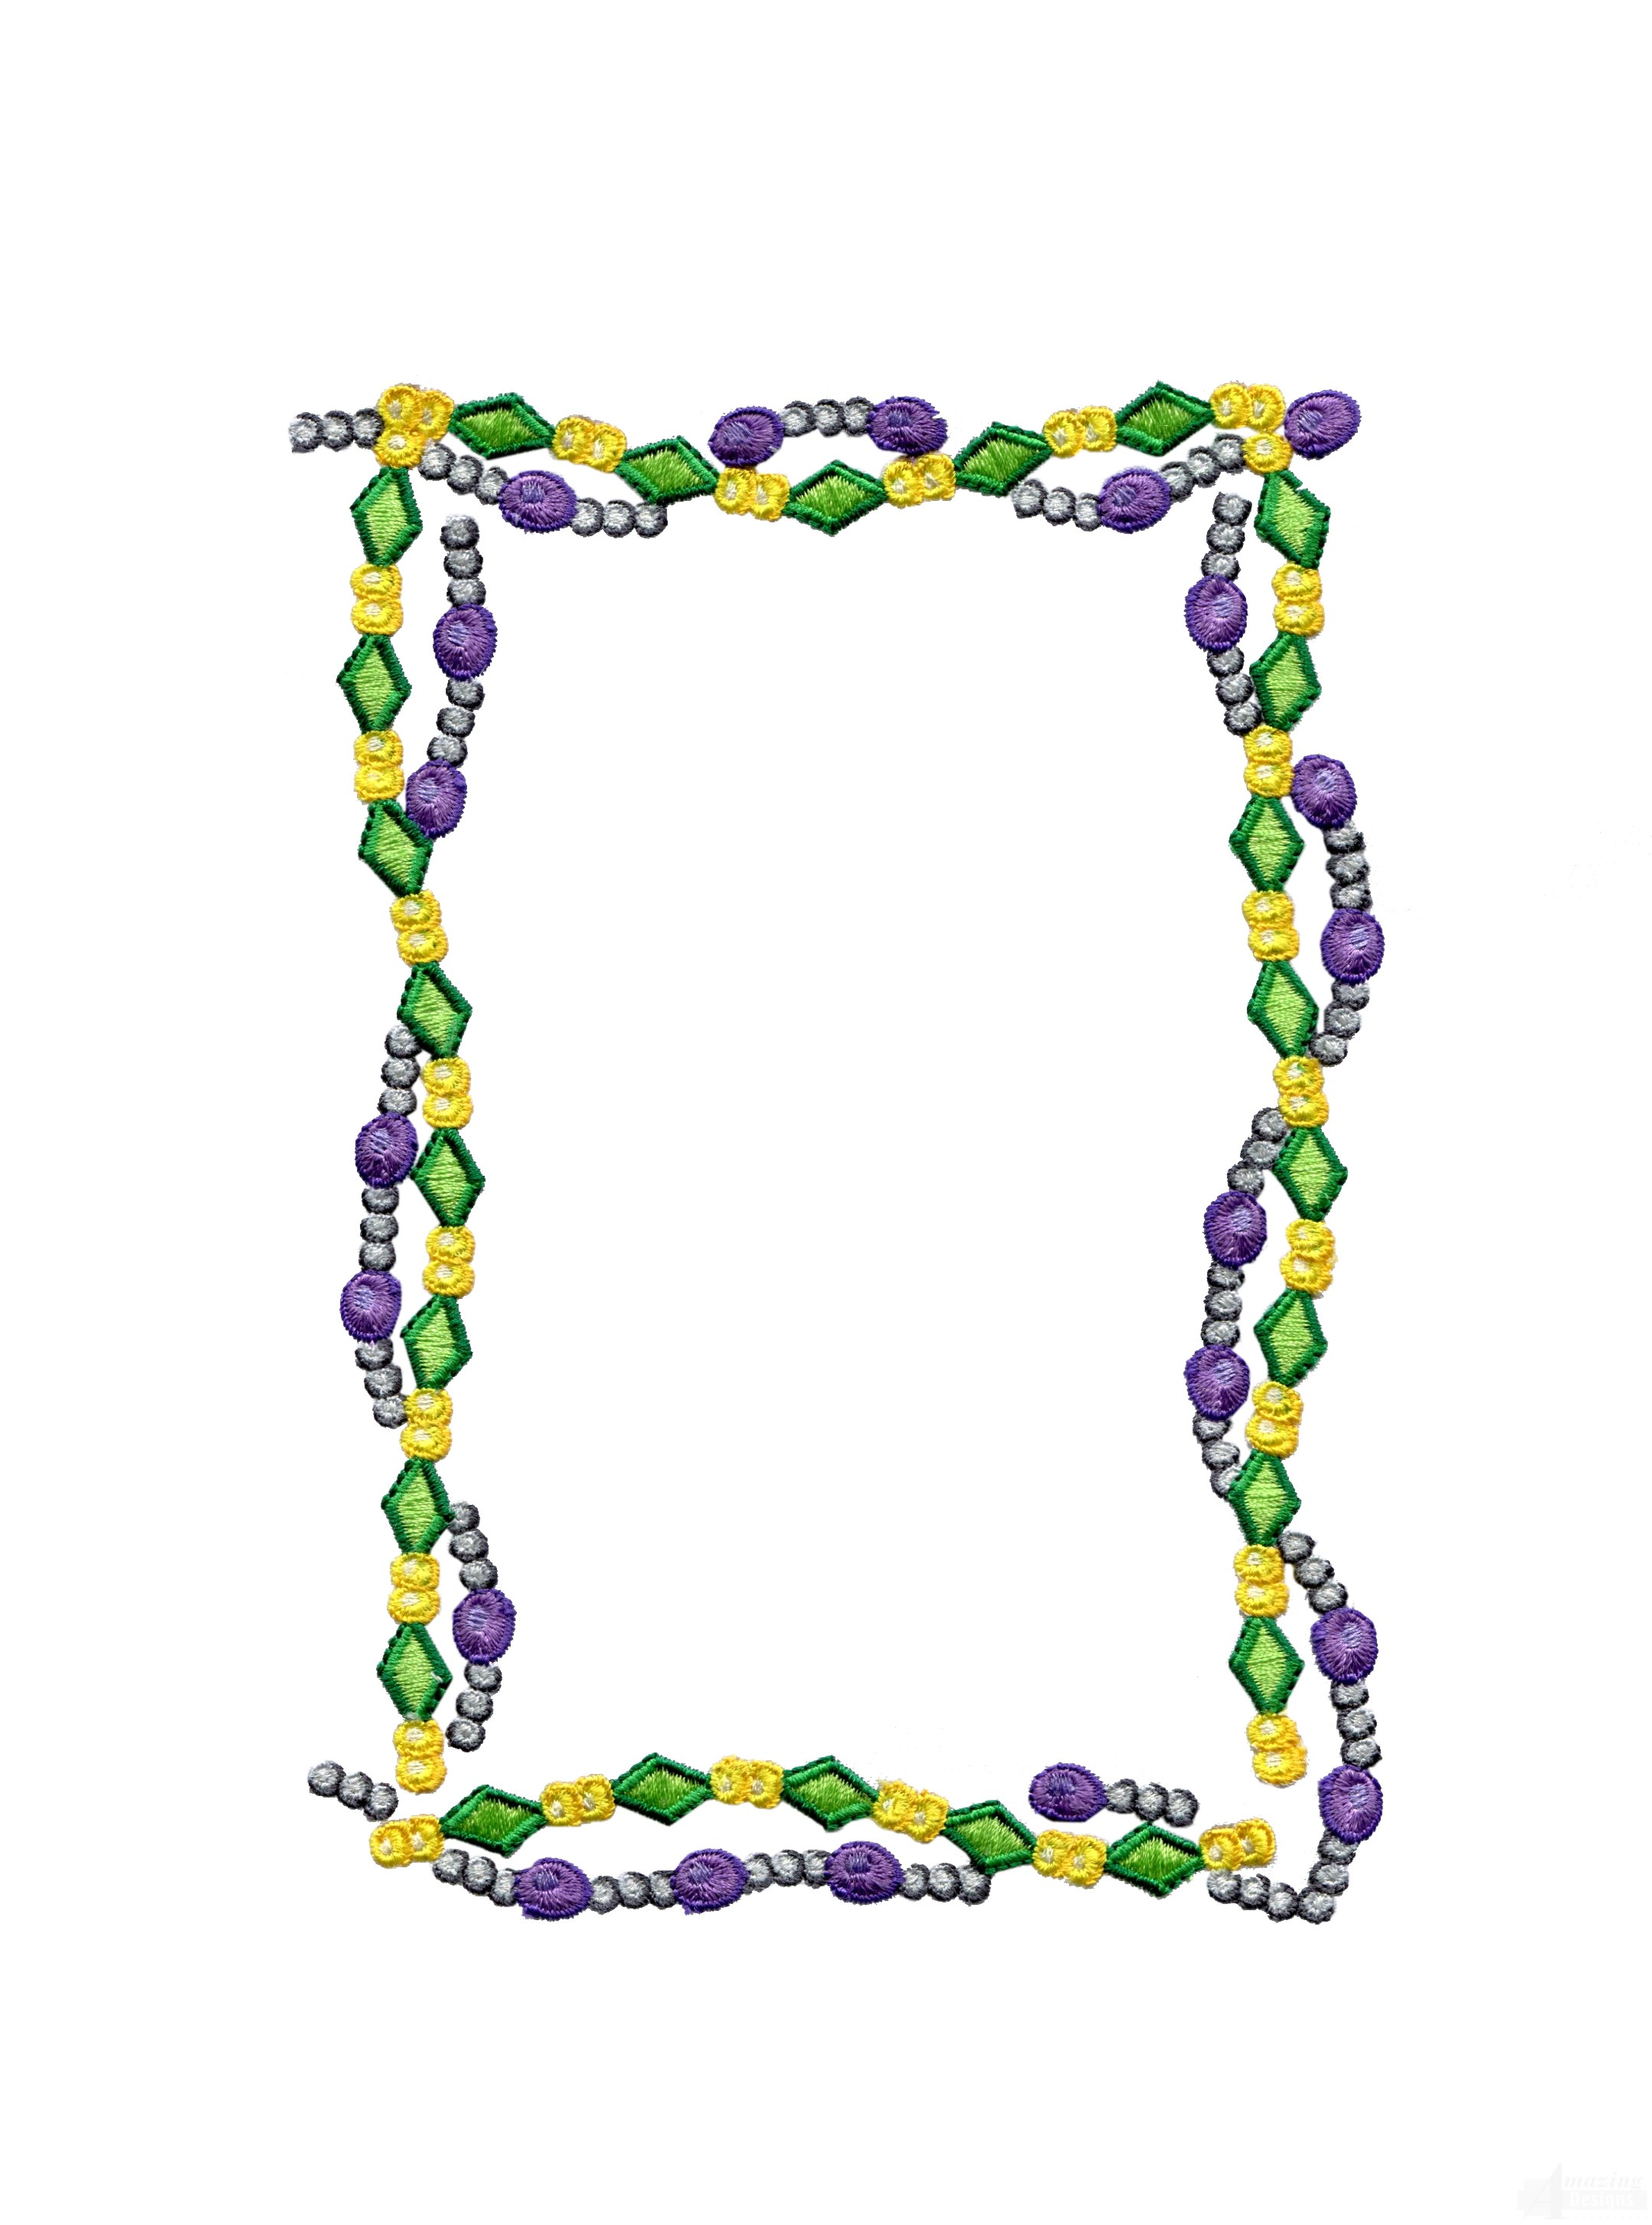 Microsoft Clip Art Mardi Gras. Mardi Gra-Microsoft Clip Art Mardi Gras. Mardi Gras Bead Frame .-16